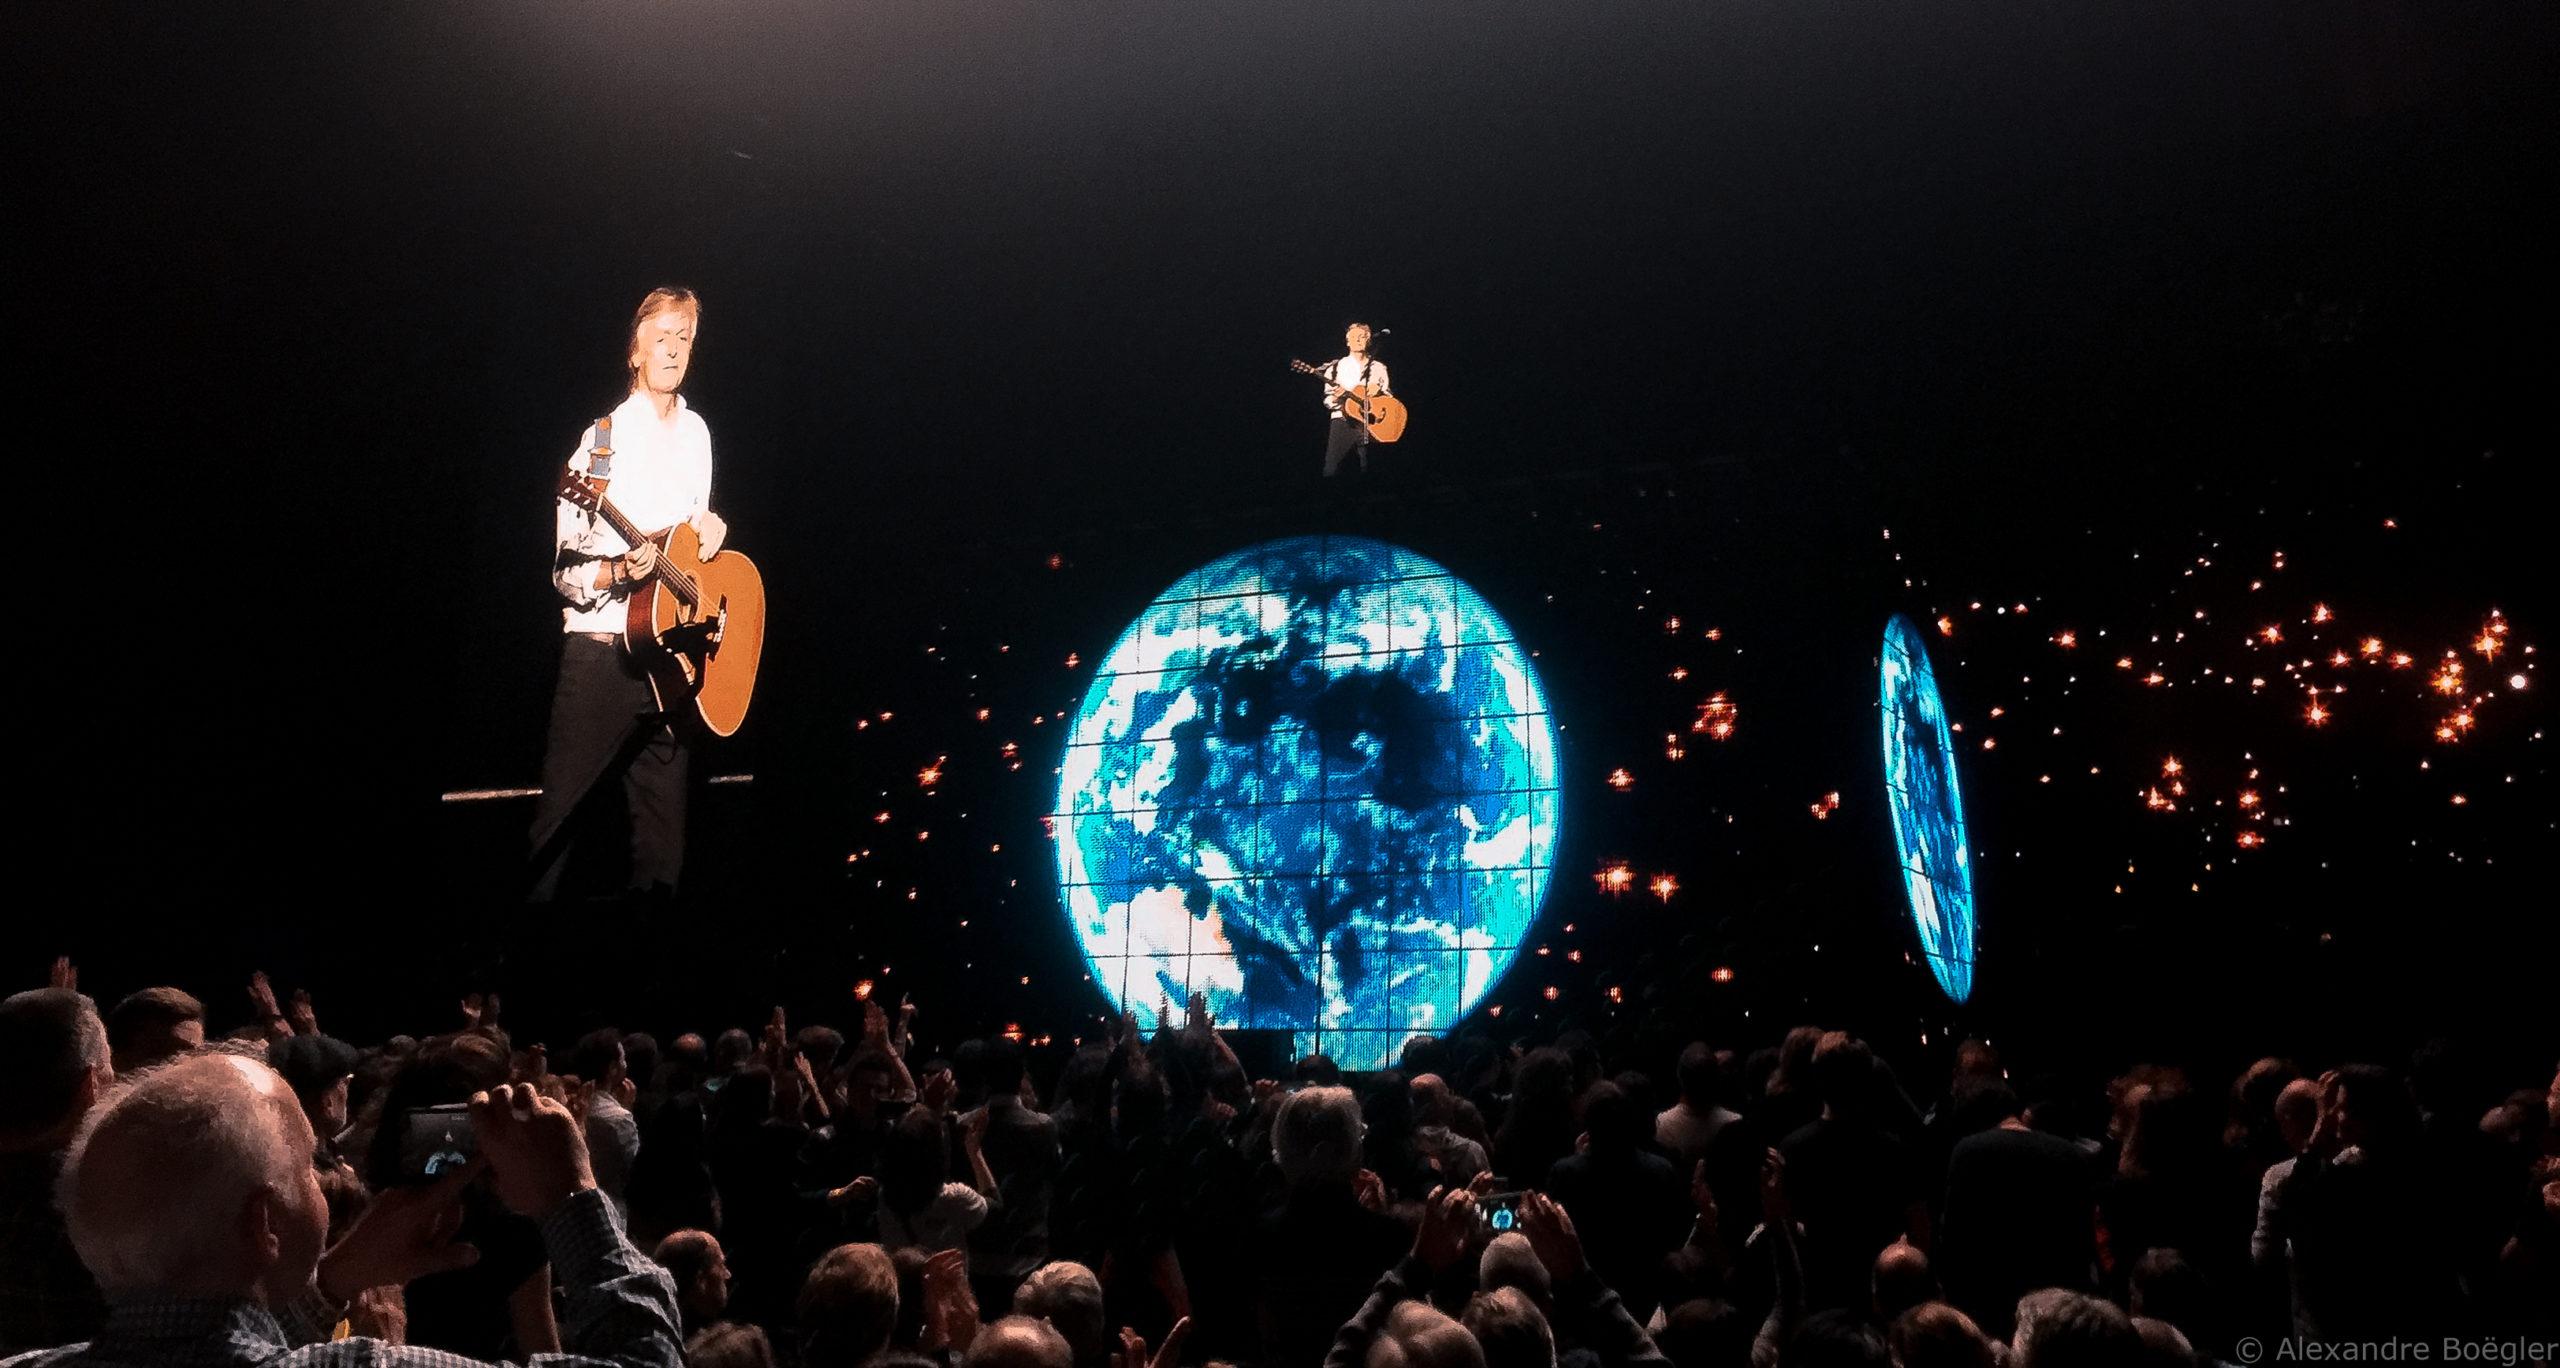 Paul McCartney à la Paris Défense Arena 28/1Paul McCartney - Paris Défense Arena 28/11/18 - Alexandre Boëgle1/18 Alexandre Boëgler